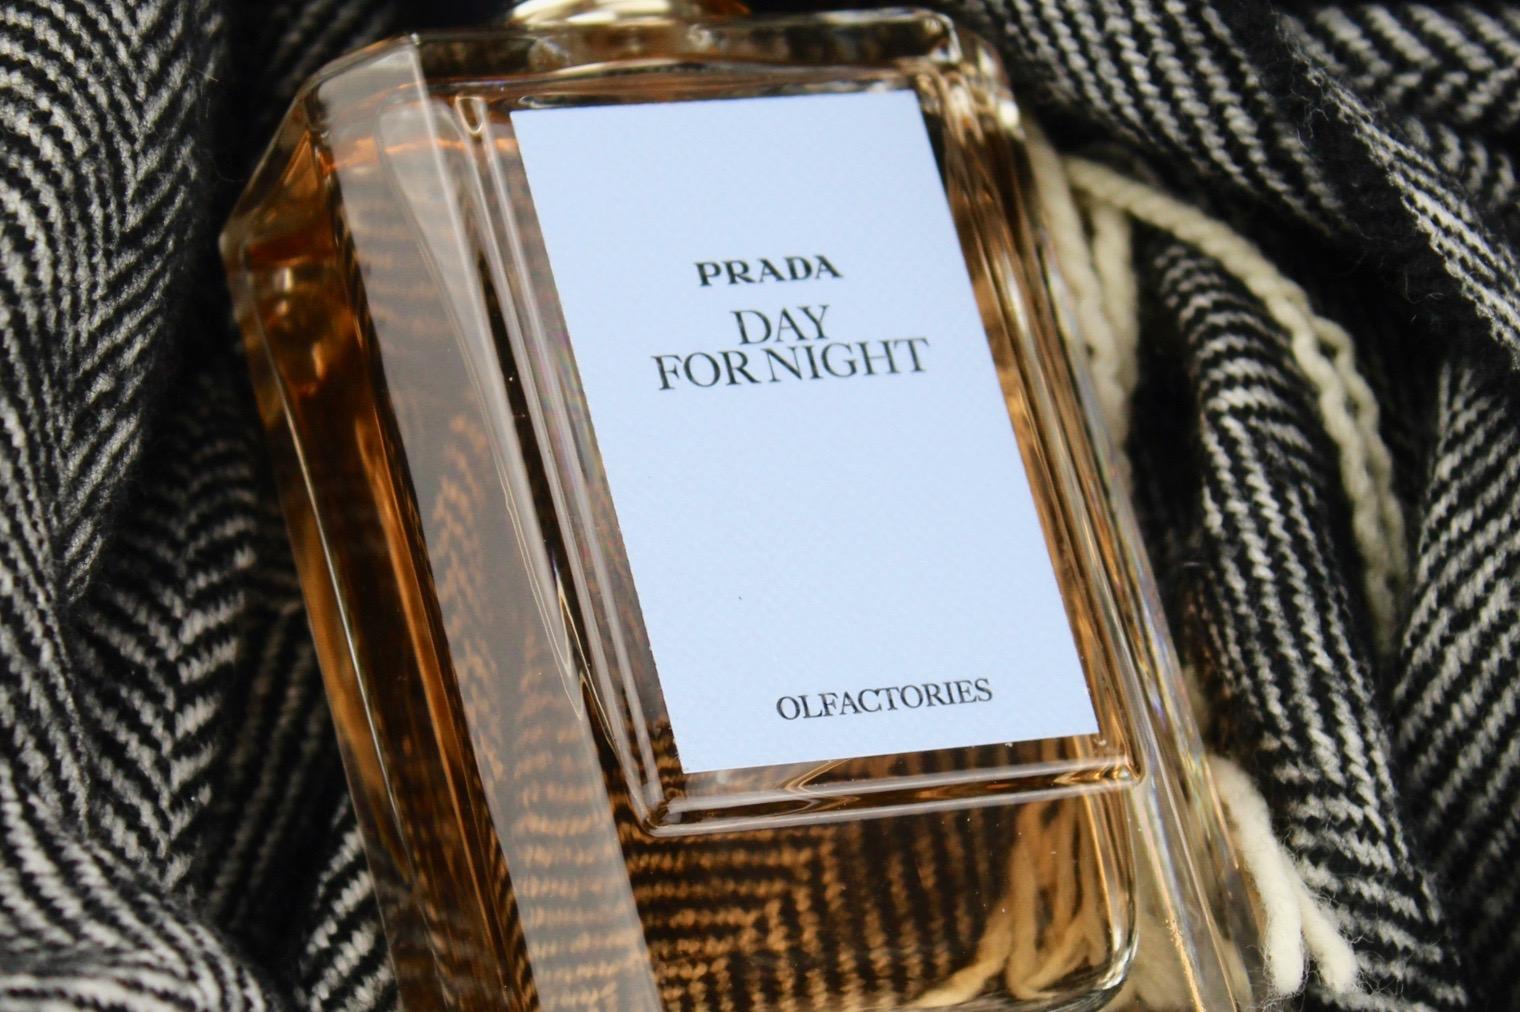 Speed For SniffDay Prada By Night Perfume The – Boy Olfactories Candy OXikPZu